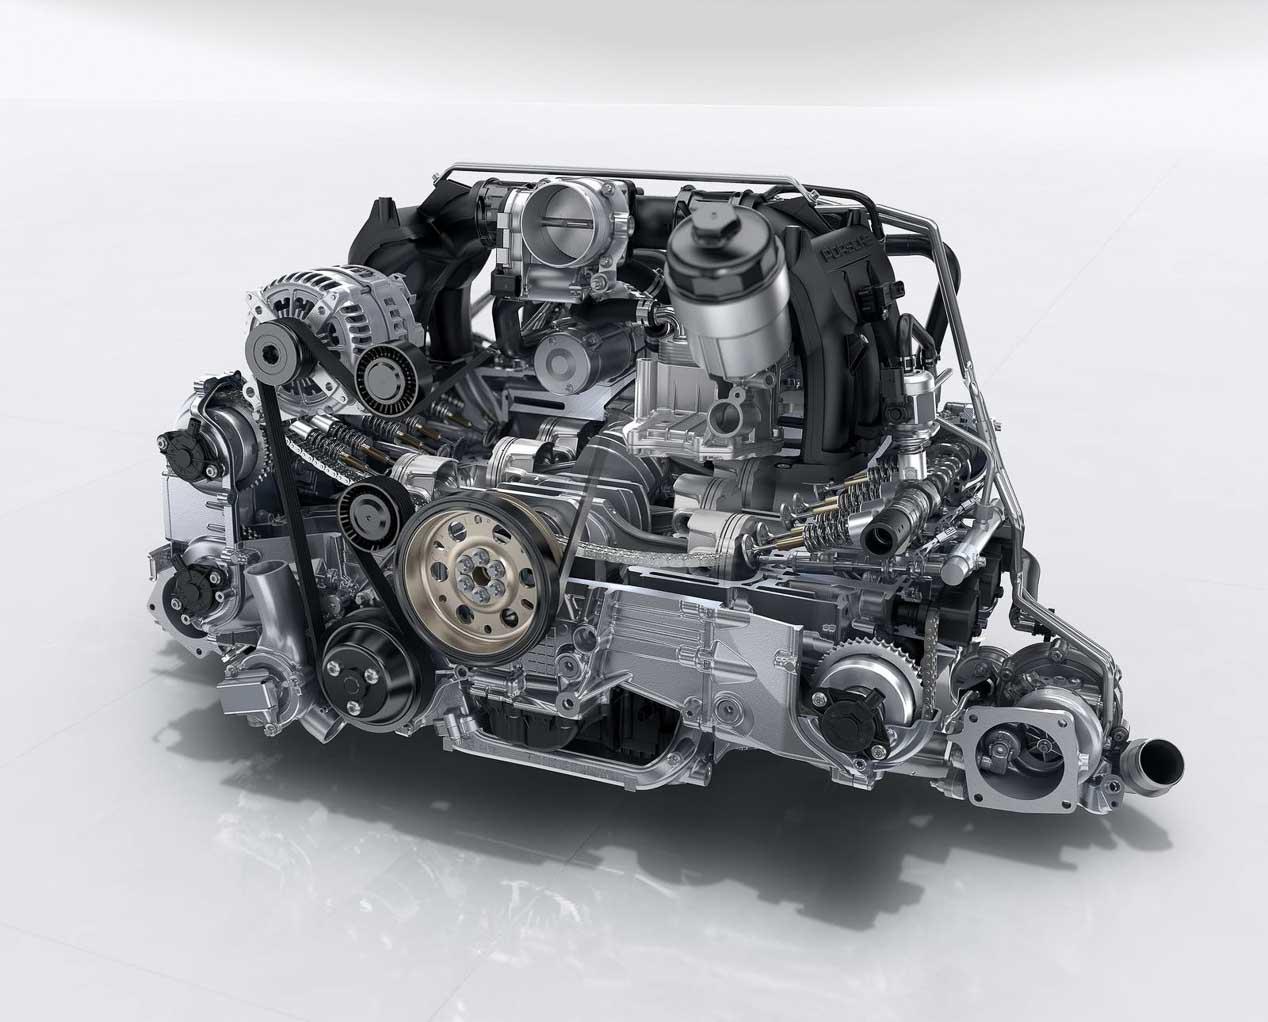 Porsche 911 GTS 2017, el próximo 911 GTS será Turbo